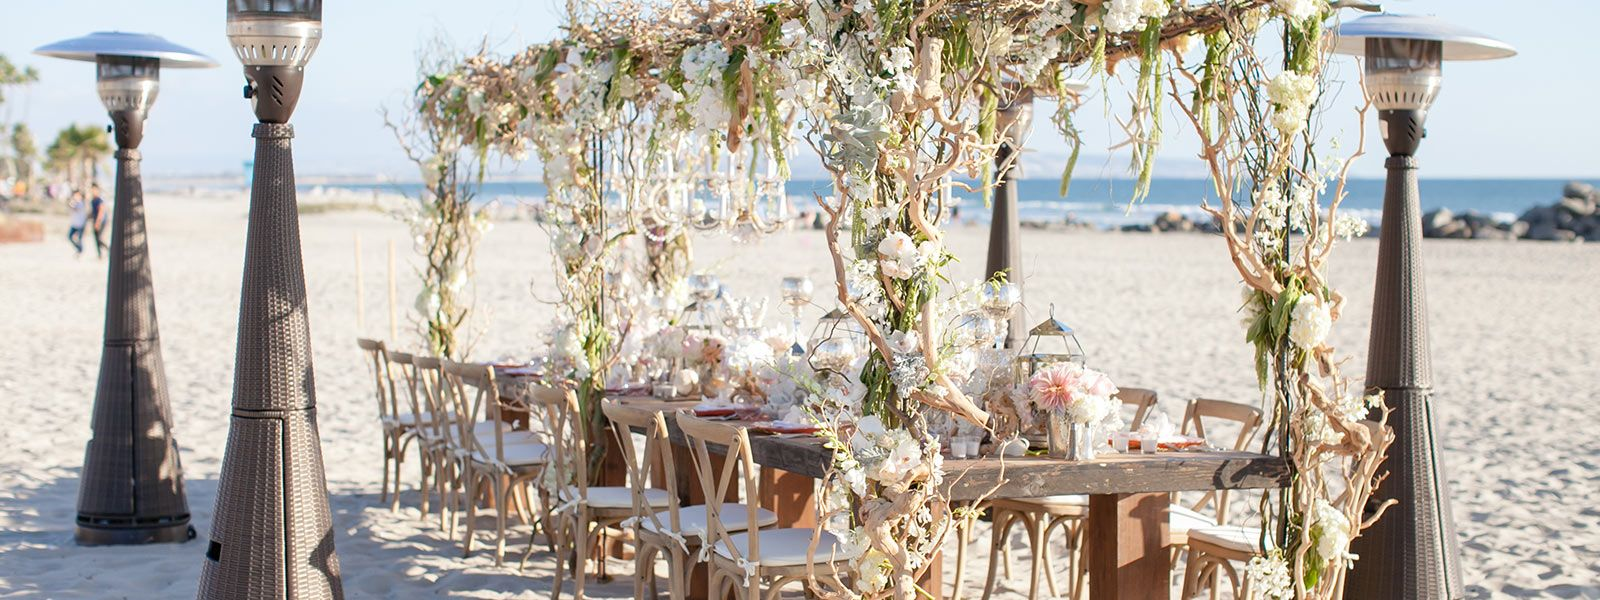 Hotel Del Coronado S Unparalleled Beachfront Setting Offers Breathtaking Options For Your Destination San Go Beach Wedding